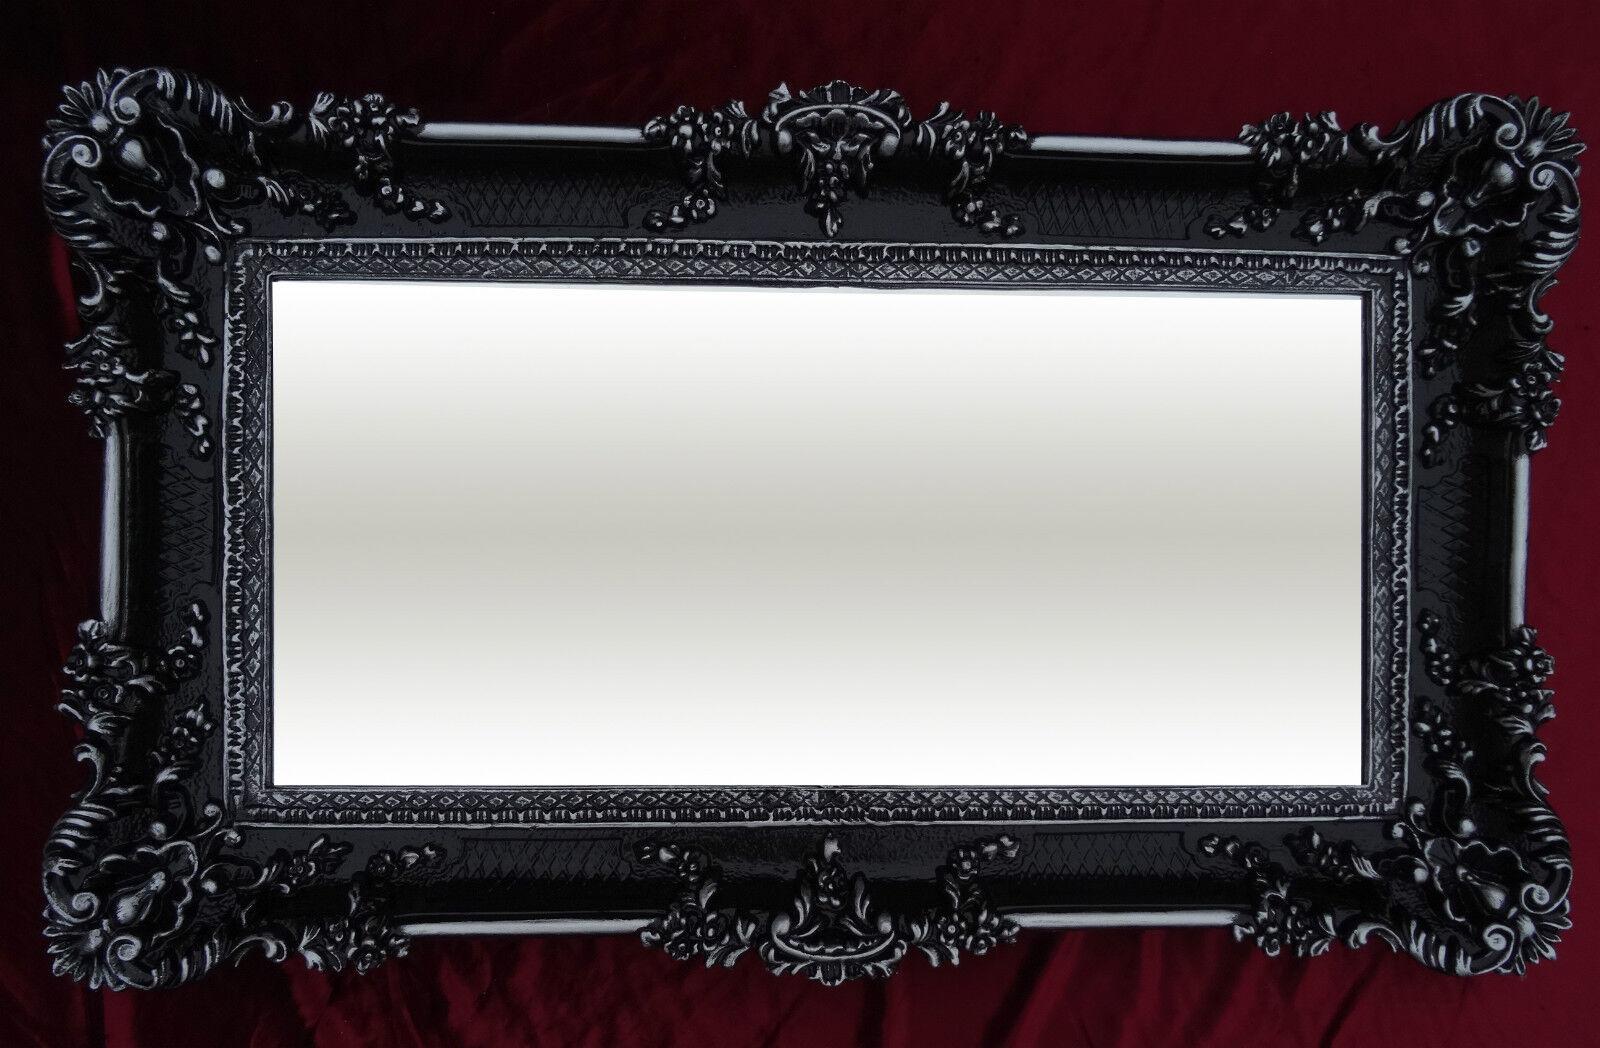 xxl renaissance wandspiegel schwarz silber barock wanddeko repro spiegel 96x57 ebay. Black Bedroom Furniture Sets. Home Design Ideas